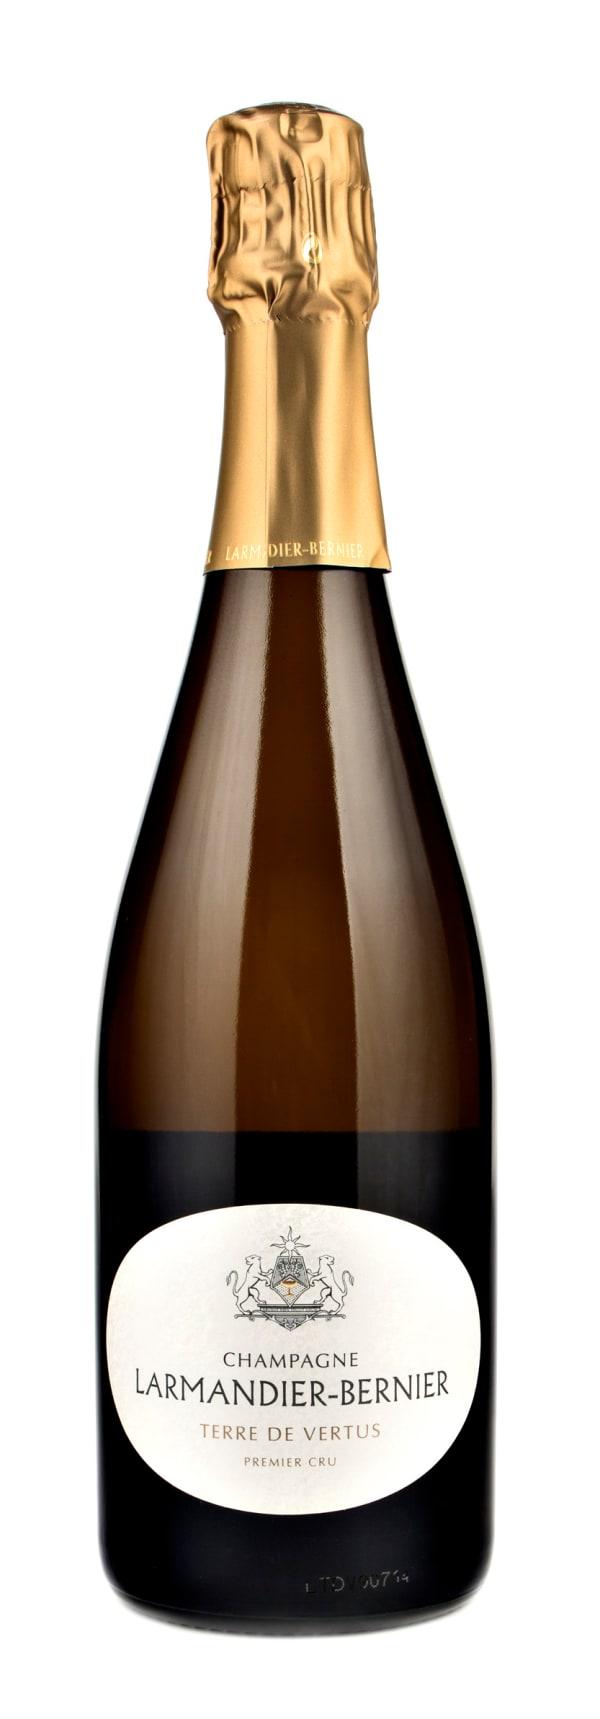 Larmandier-Bernier Terre de Vertus Premier Cru Champagne Brut 2013